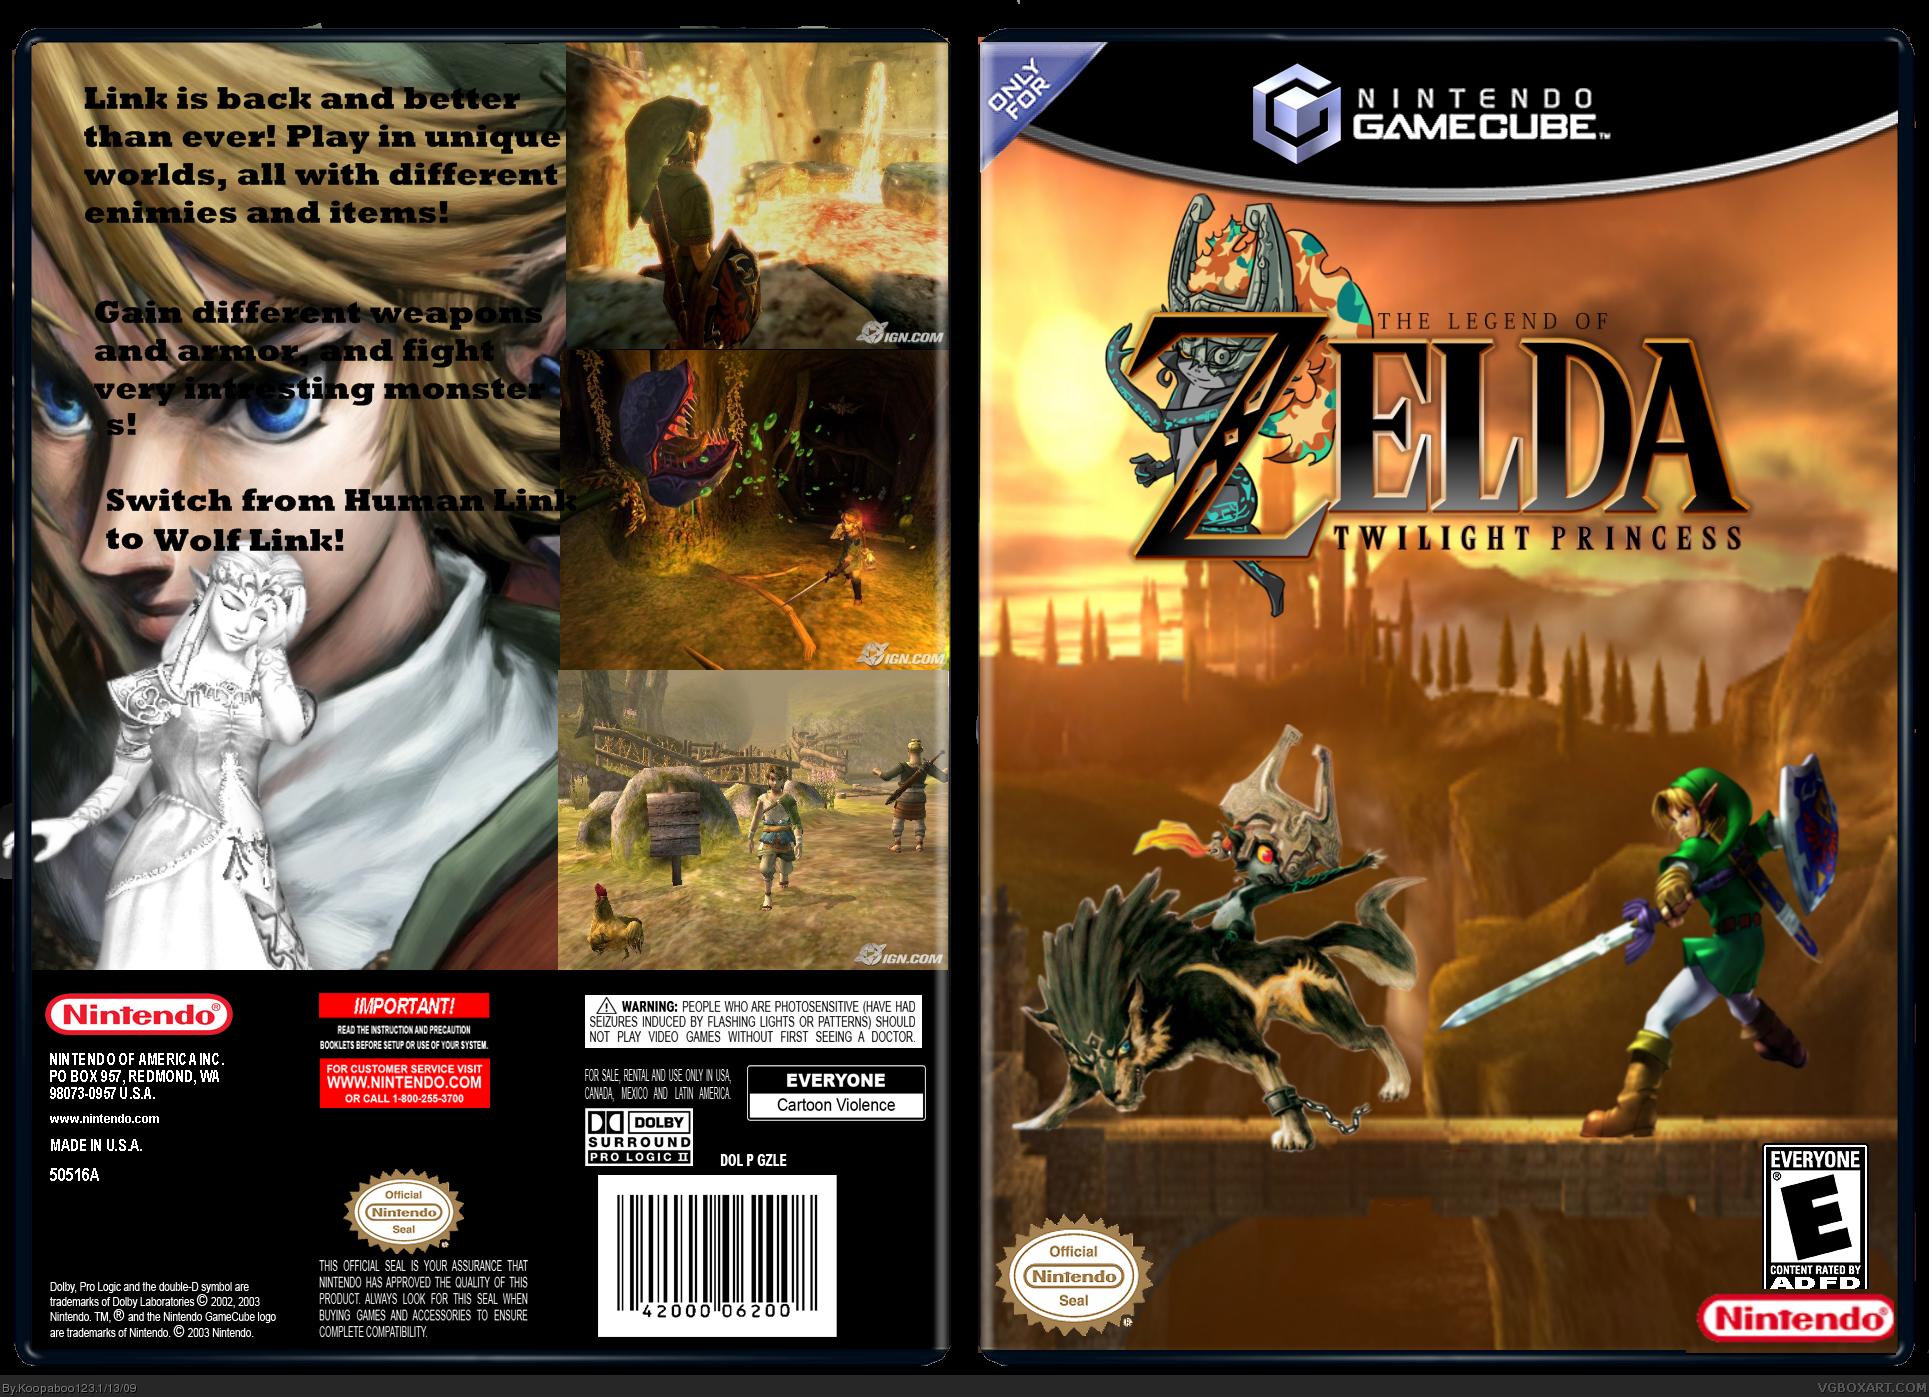 legend of zelda twilight princess gamecube box art cover